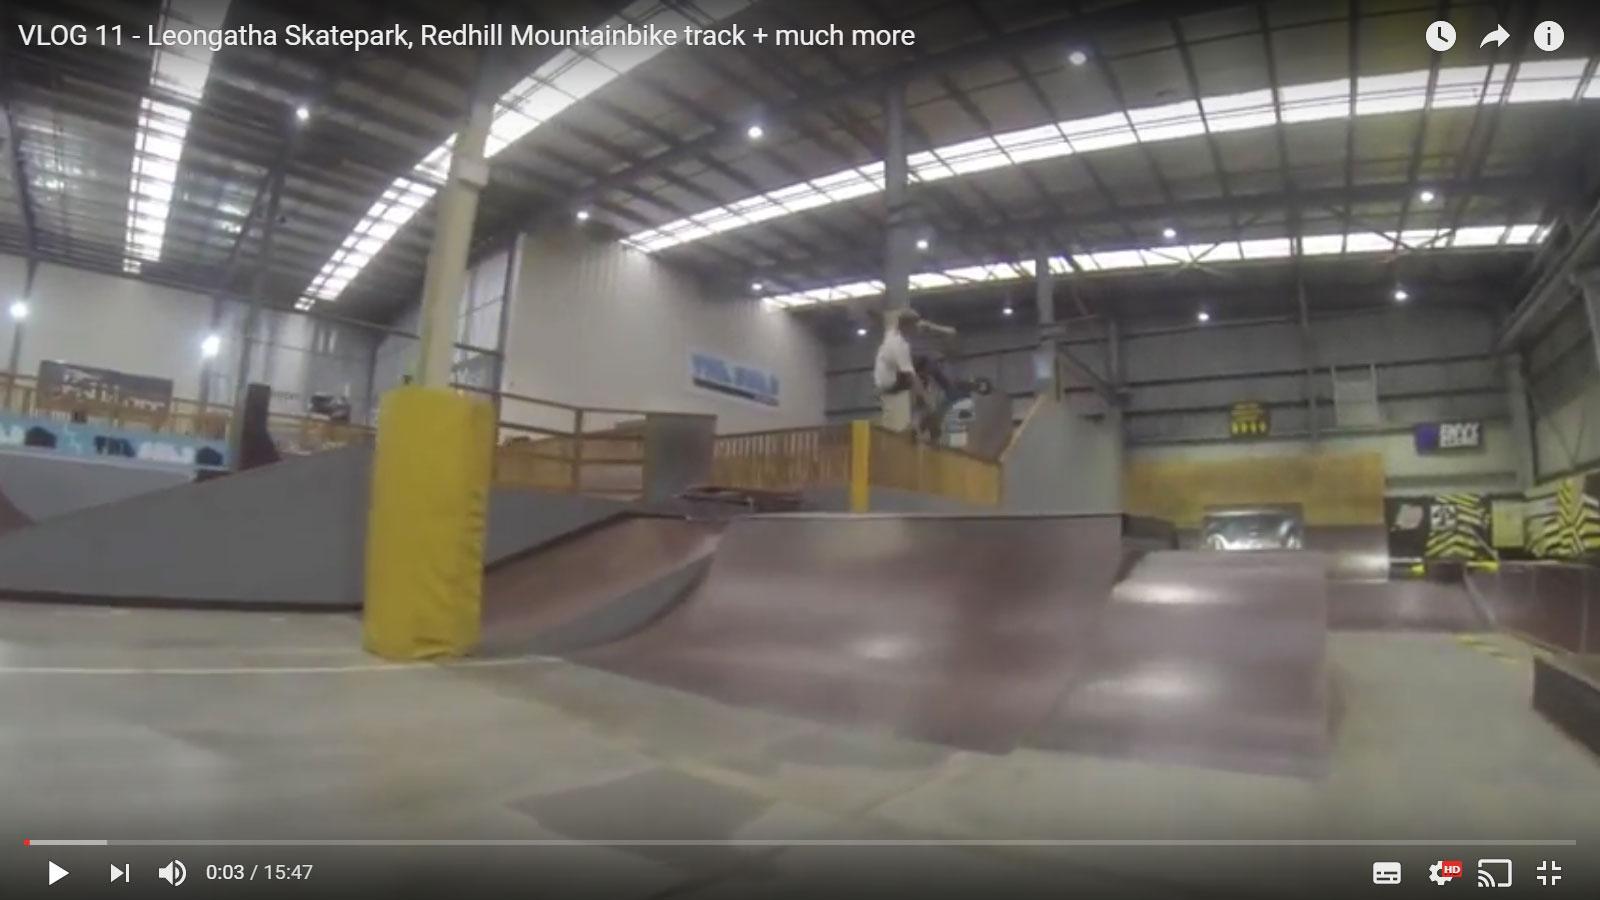 Vlog 11 – Leongatha Skatepark, Redhill Mountainbike track + much more